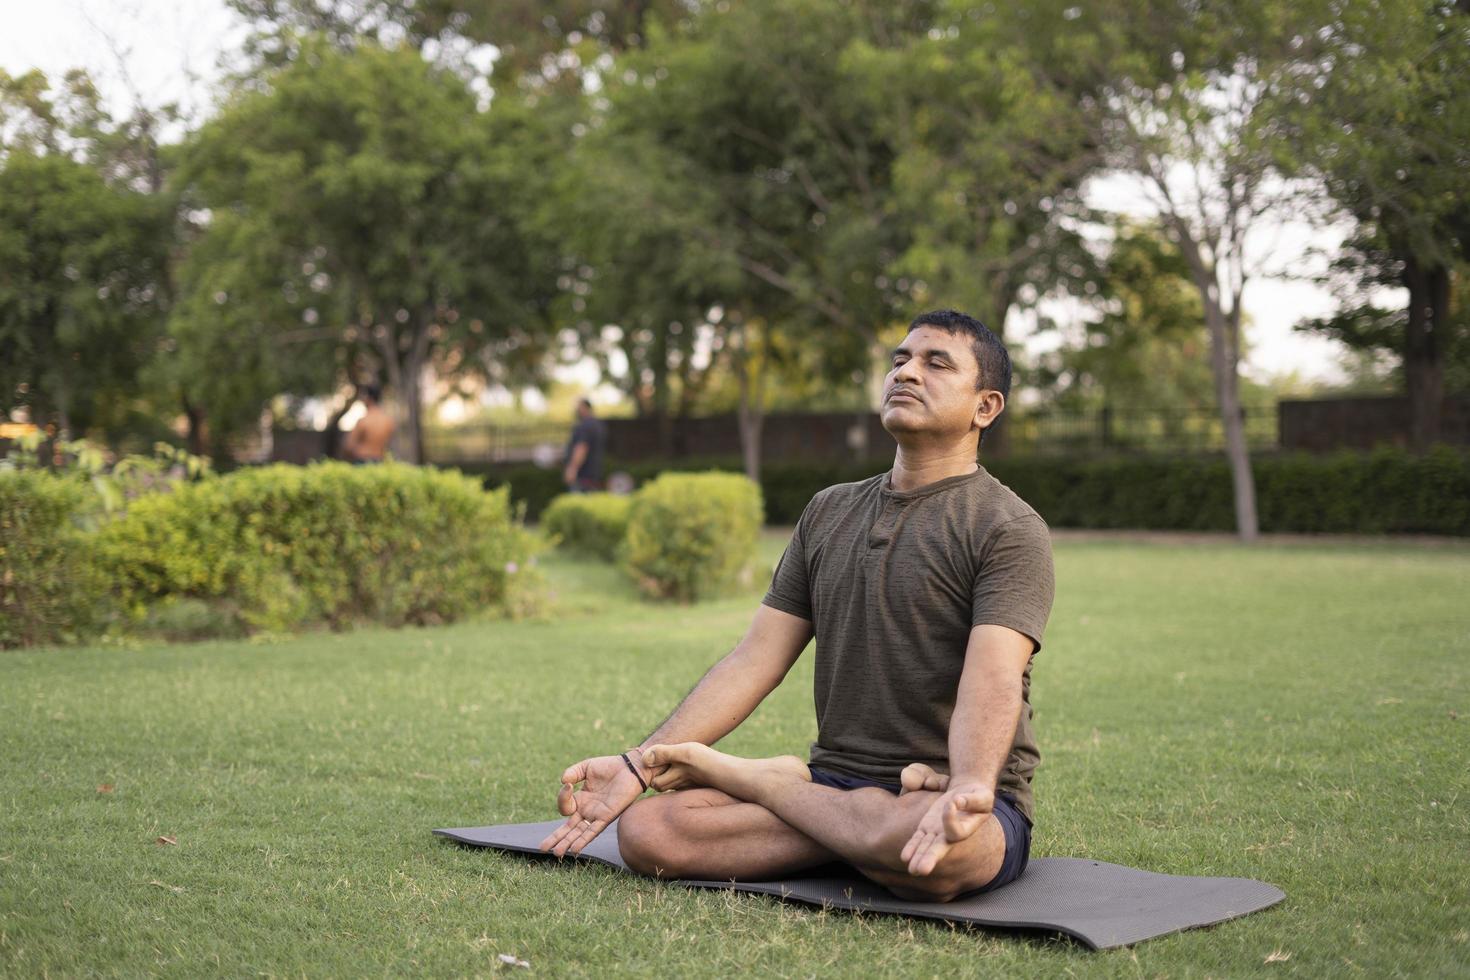 Mann macht Yoga foto